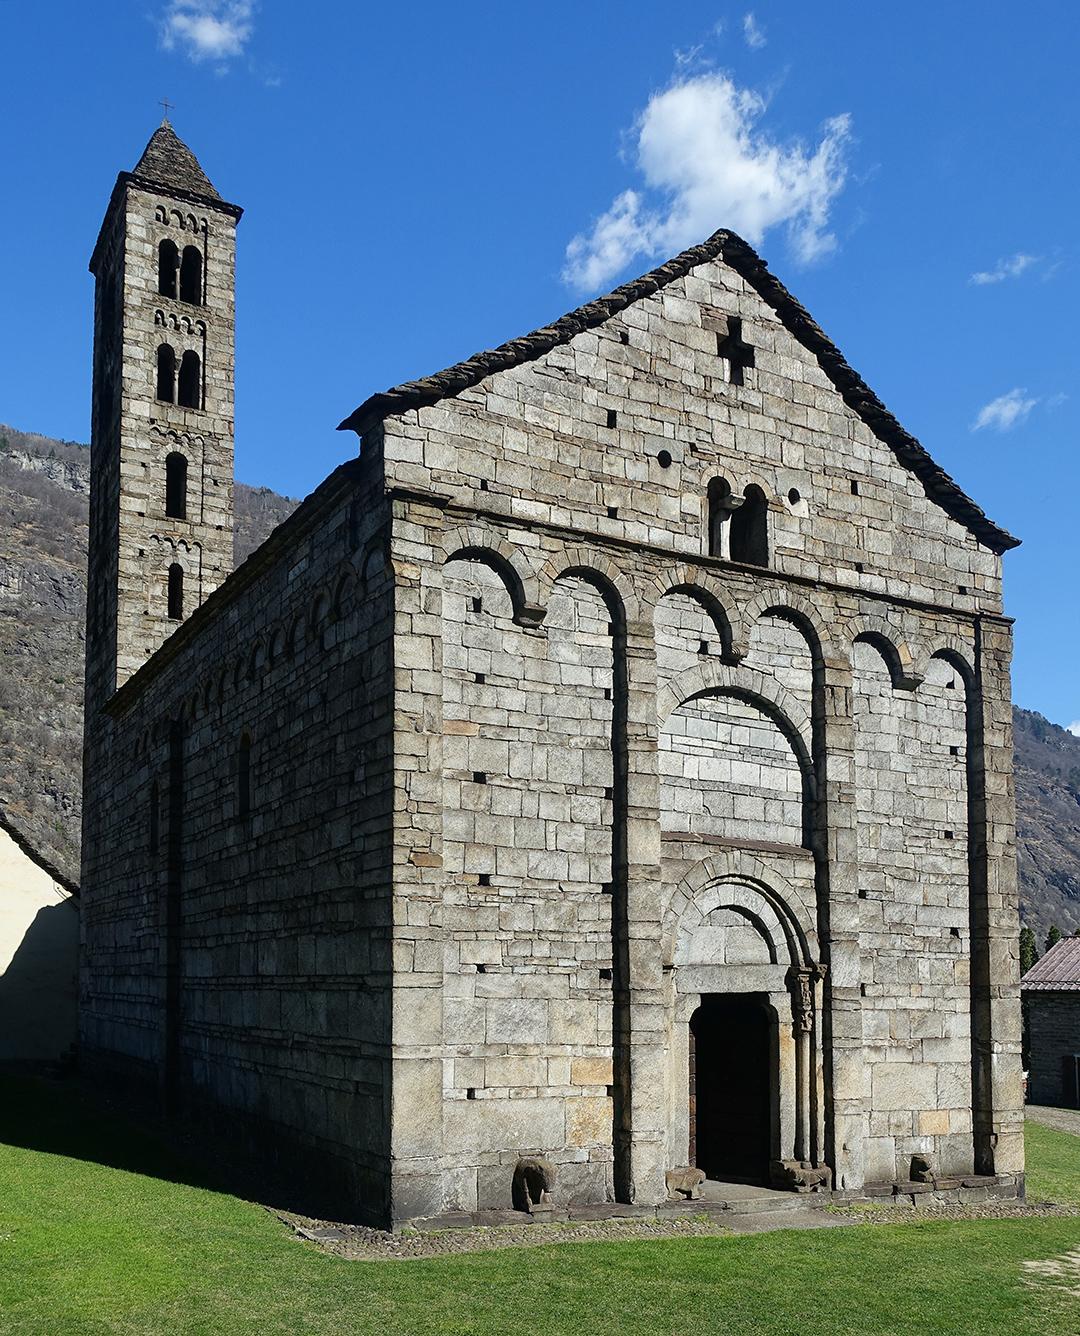 Giornico, San Nicolao, erbaut um 1100.